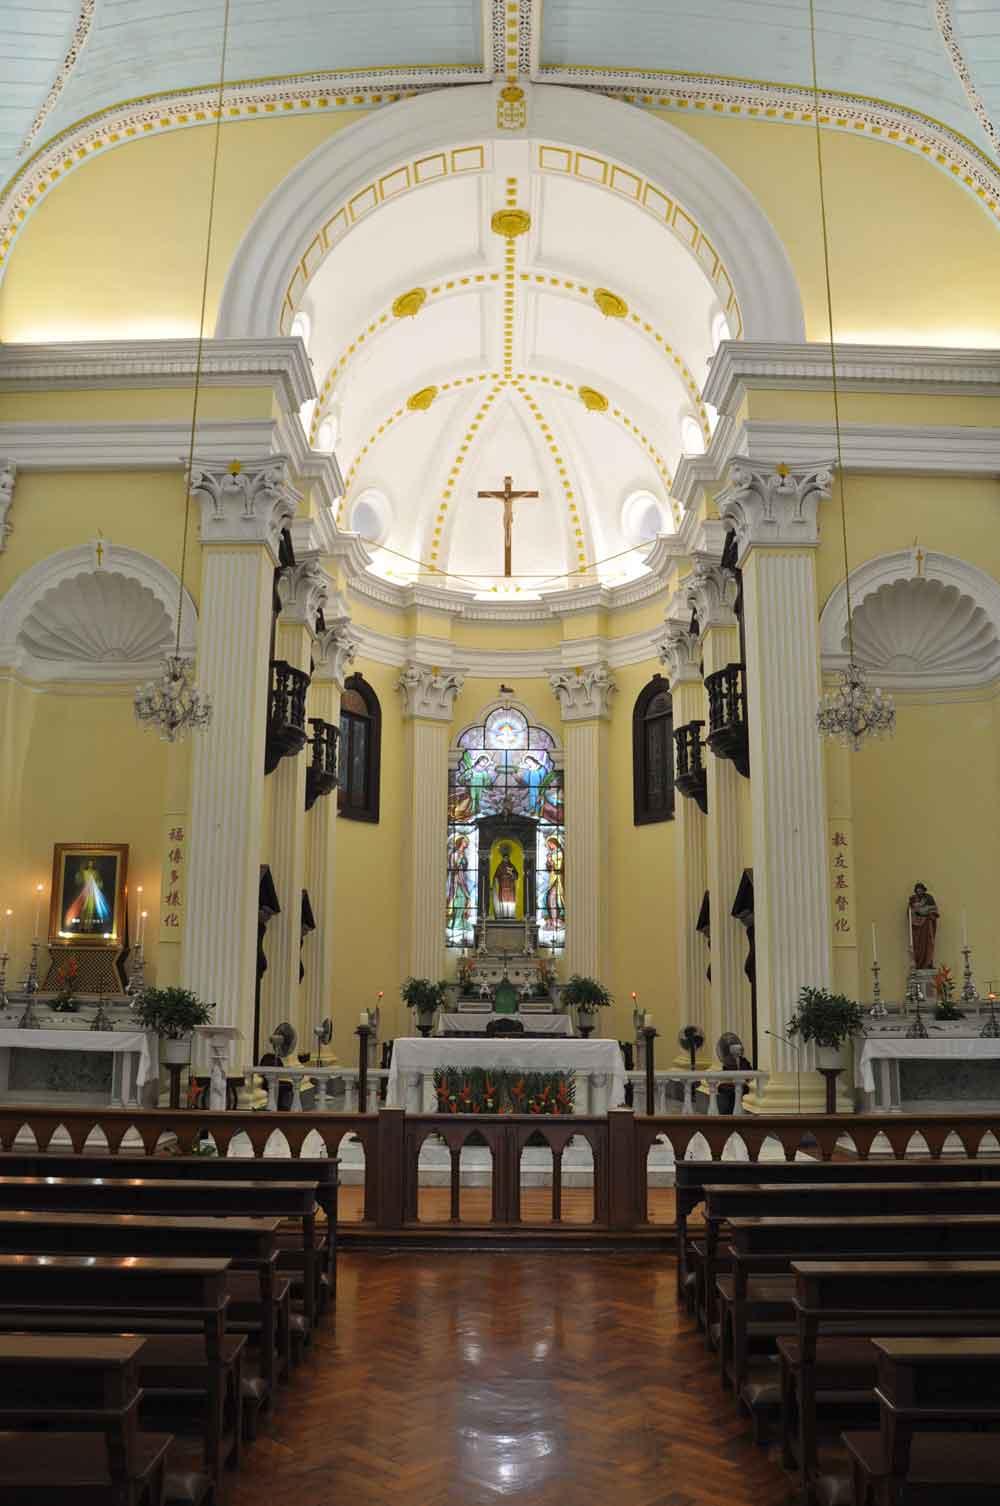 St. Lawrence Church Macau interior